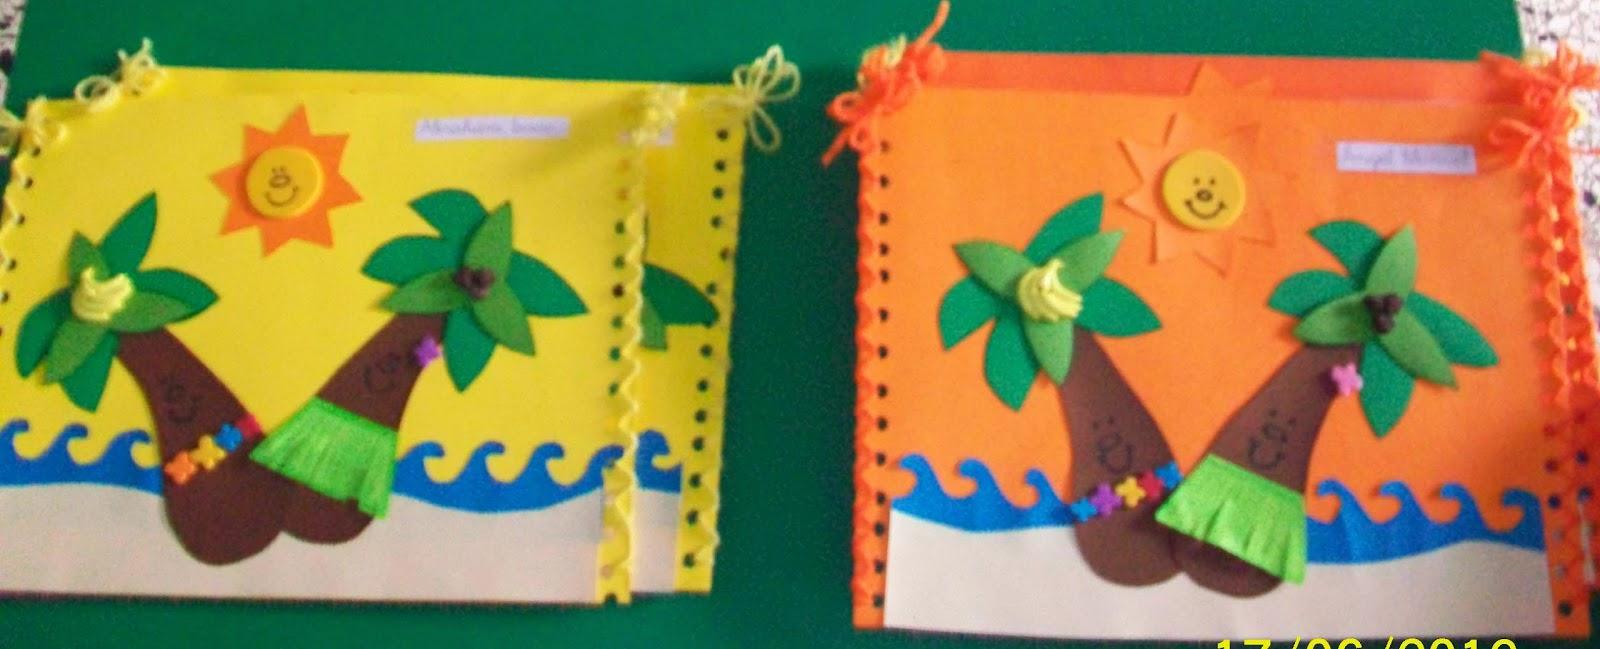 Manualidades carpetas escolares decoradas gu a de for Decoracion verano para jardin infantil